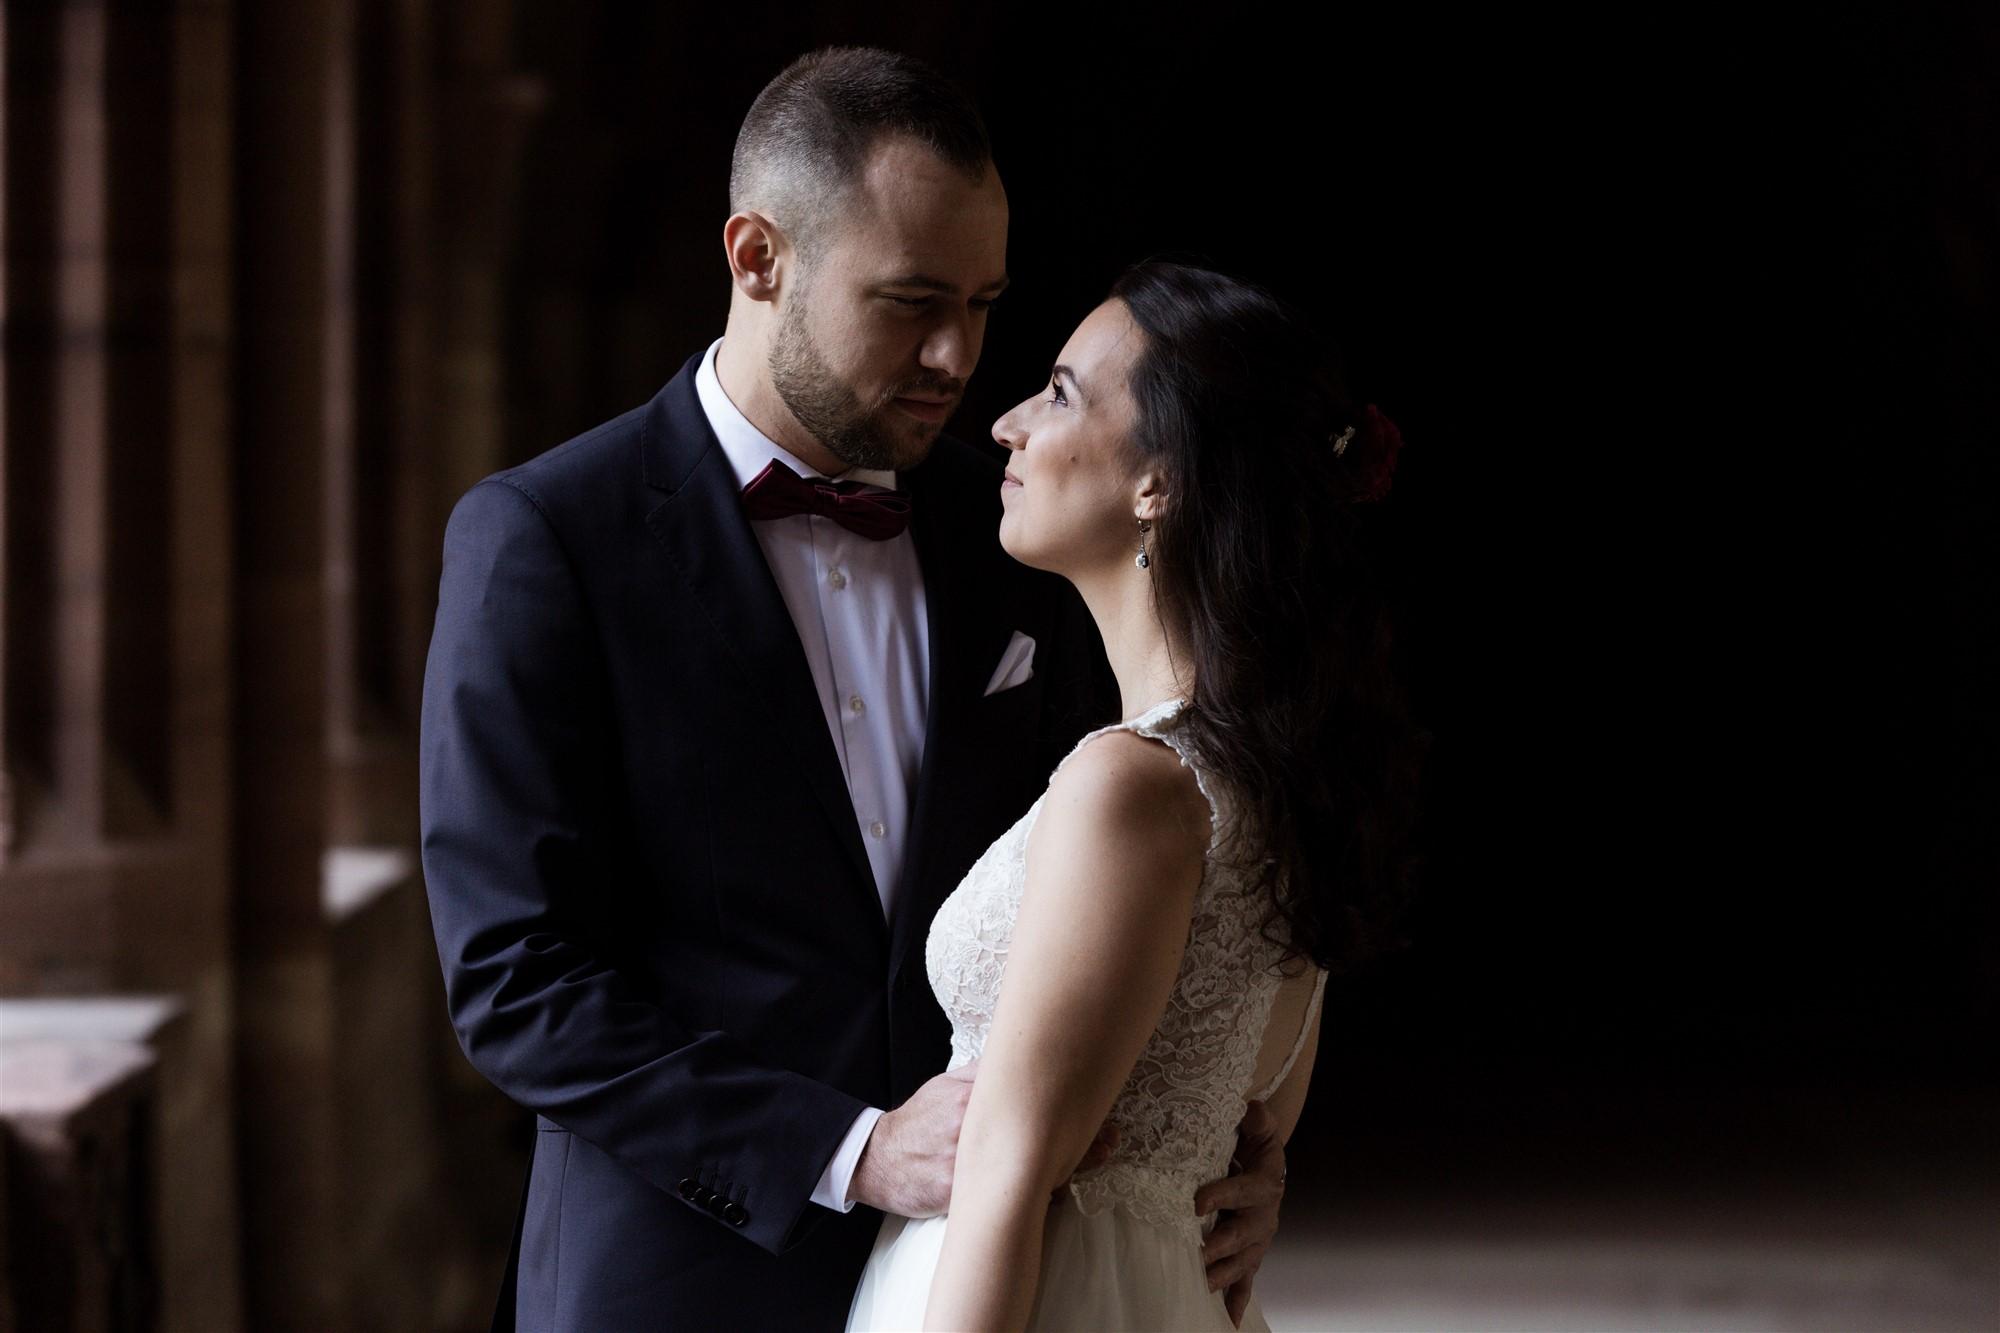 Brautpaar Fotoshooting im Basler Münster - Das Brautpaar sieht sich voller Liebe an